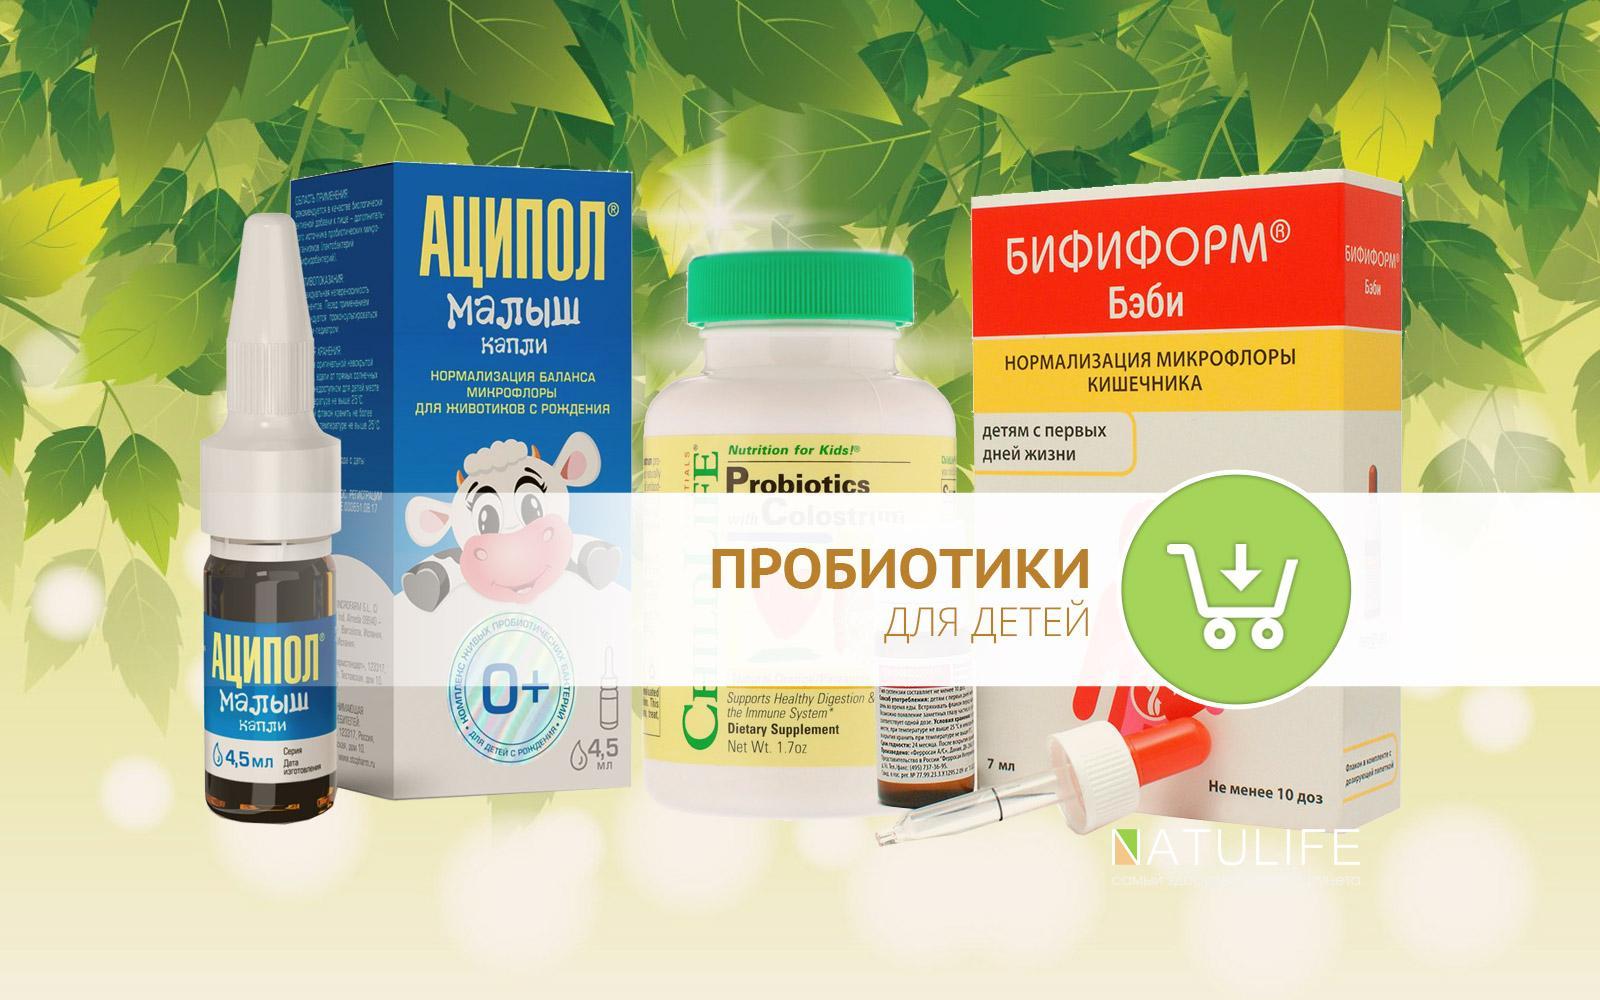 Пробиотики при приеме антибиотиков: рекомендации медиков